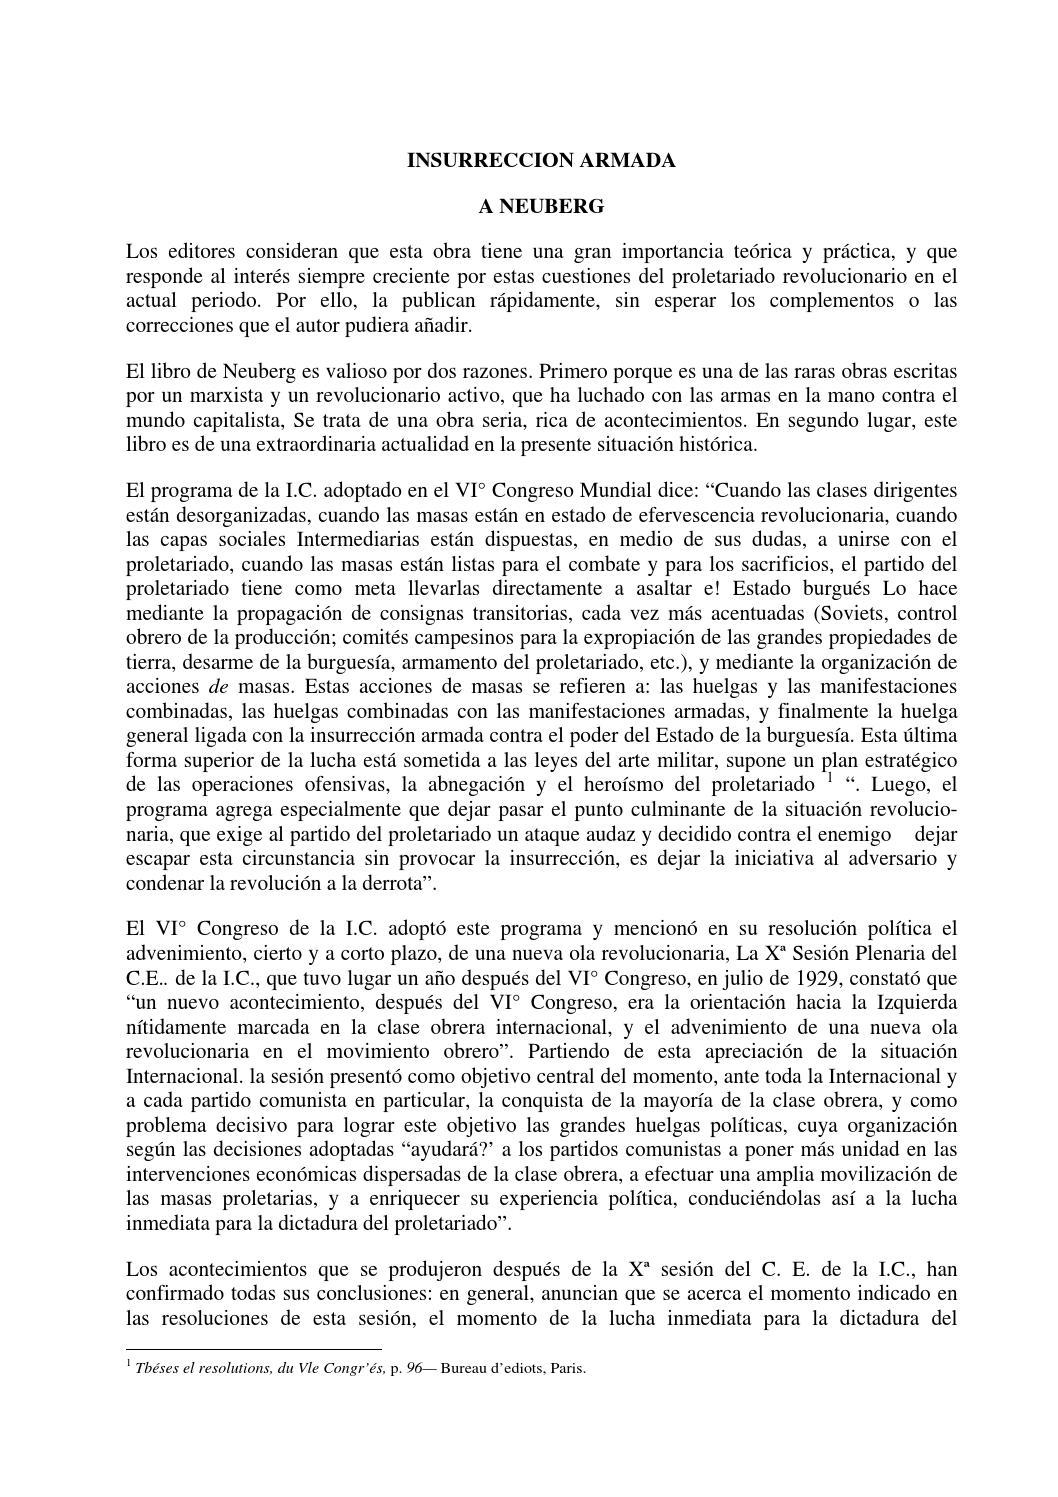 la insurreccion armada pdf by Lagarta Juana - issuu